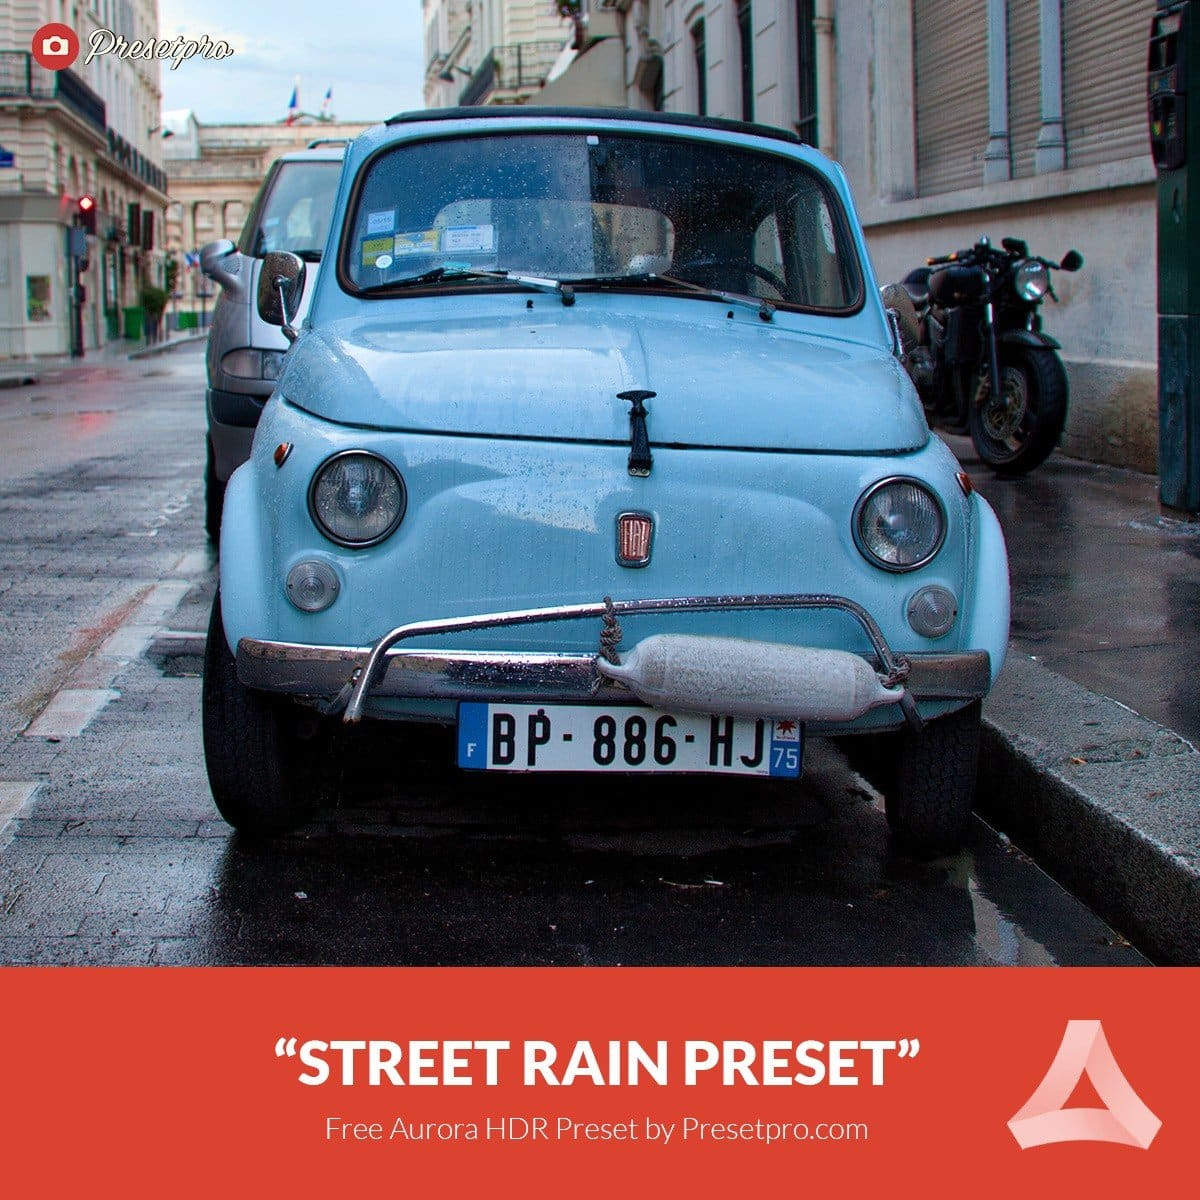 Free-Aurora-HDR-Preset-Street-Rain-Presetpro